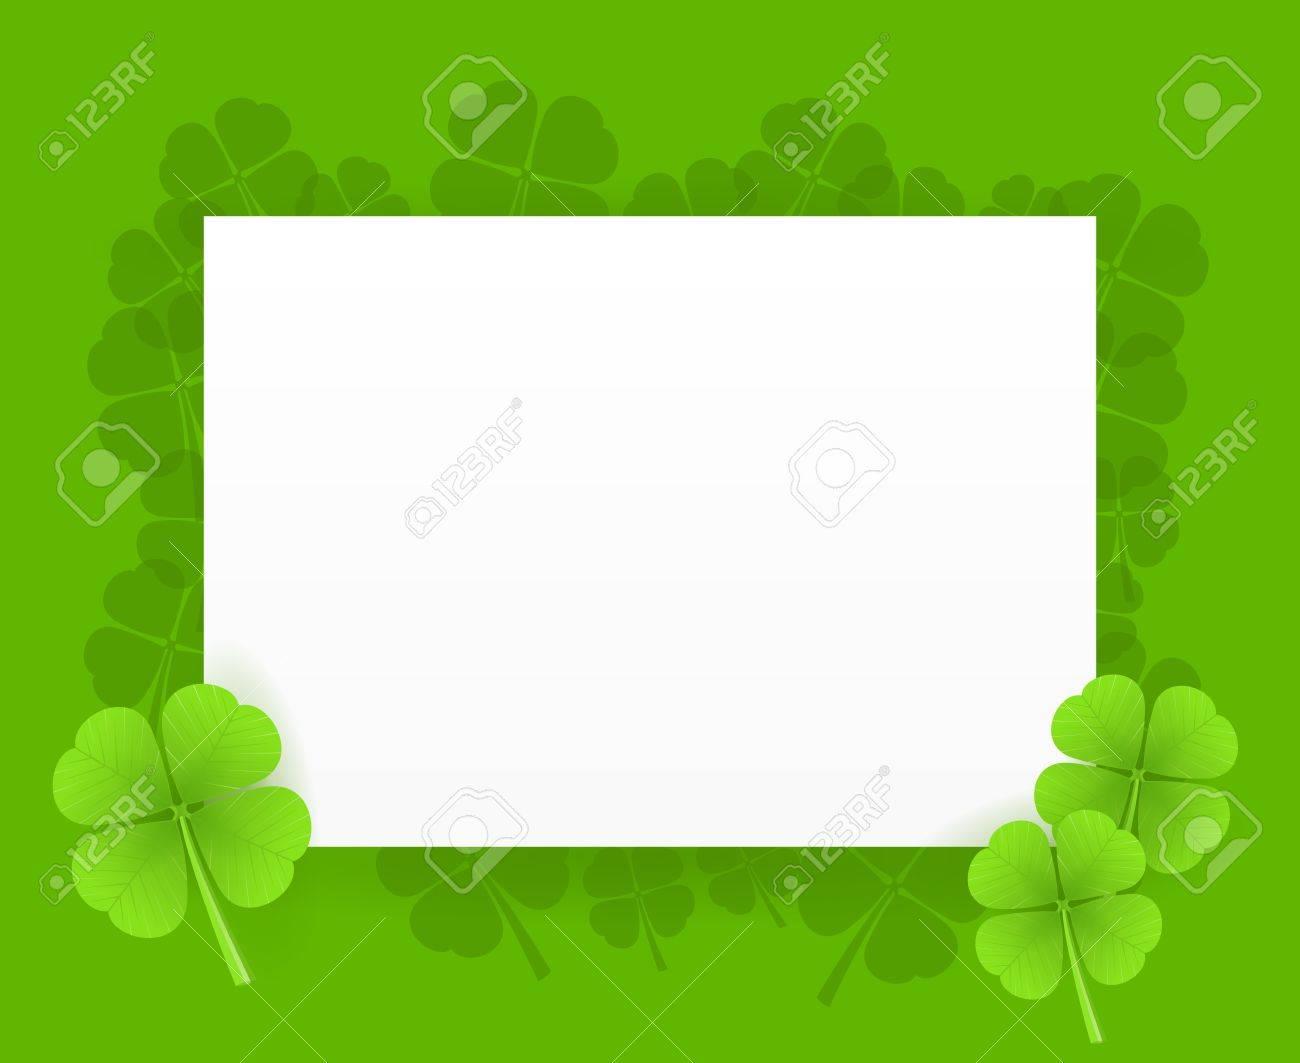 St Patrick Greeting Card Stock Vector - 12484357